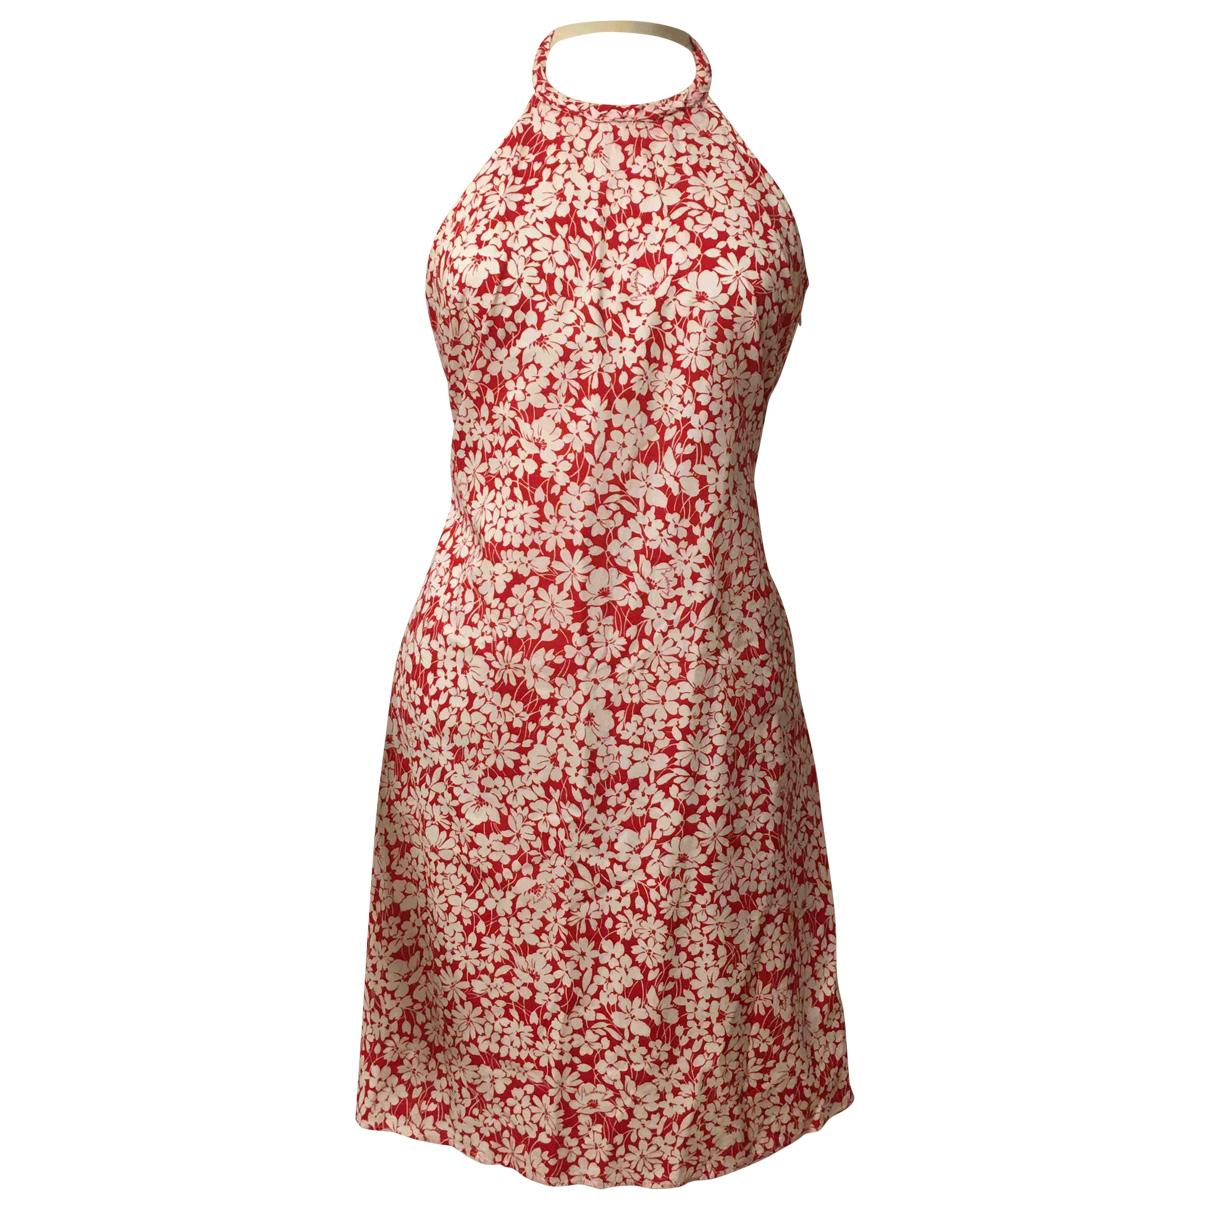 Burberry N Multicolour Cotton dress for Women 12 UK